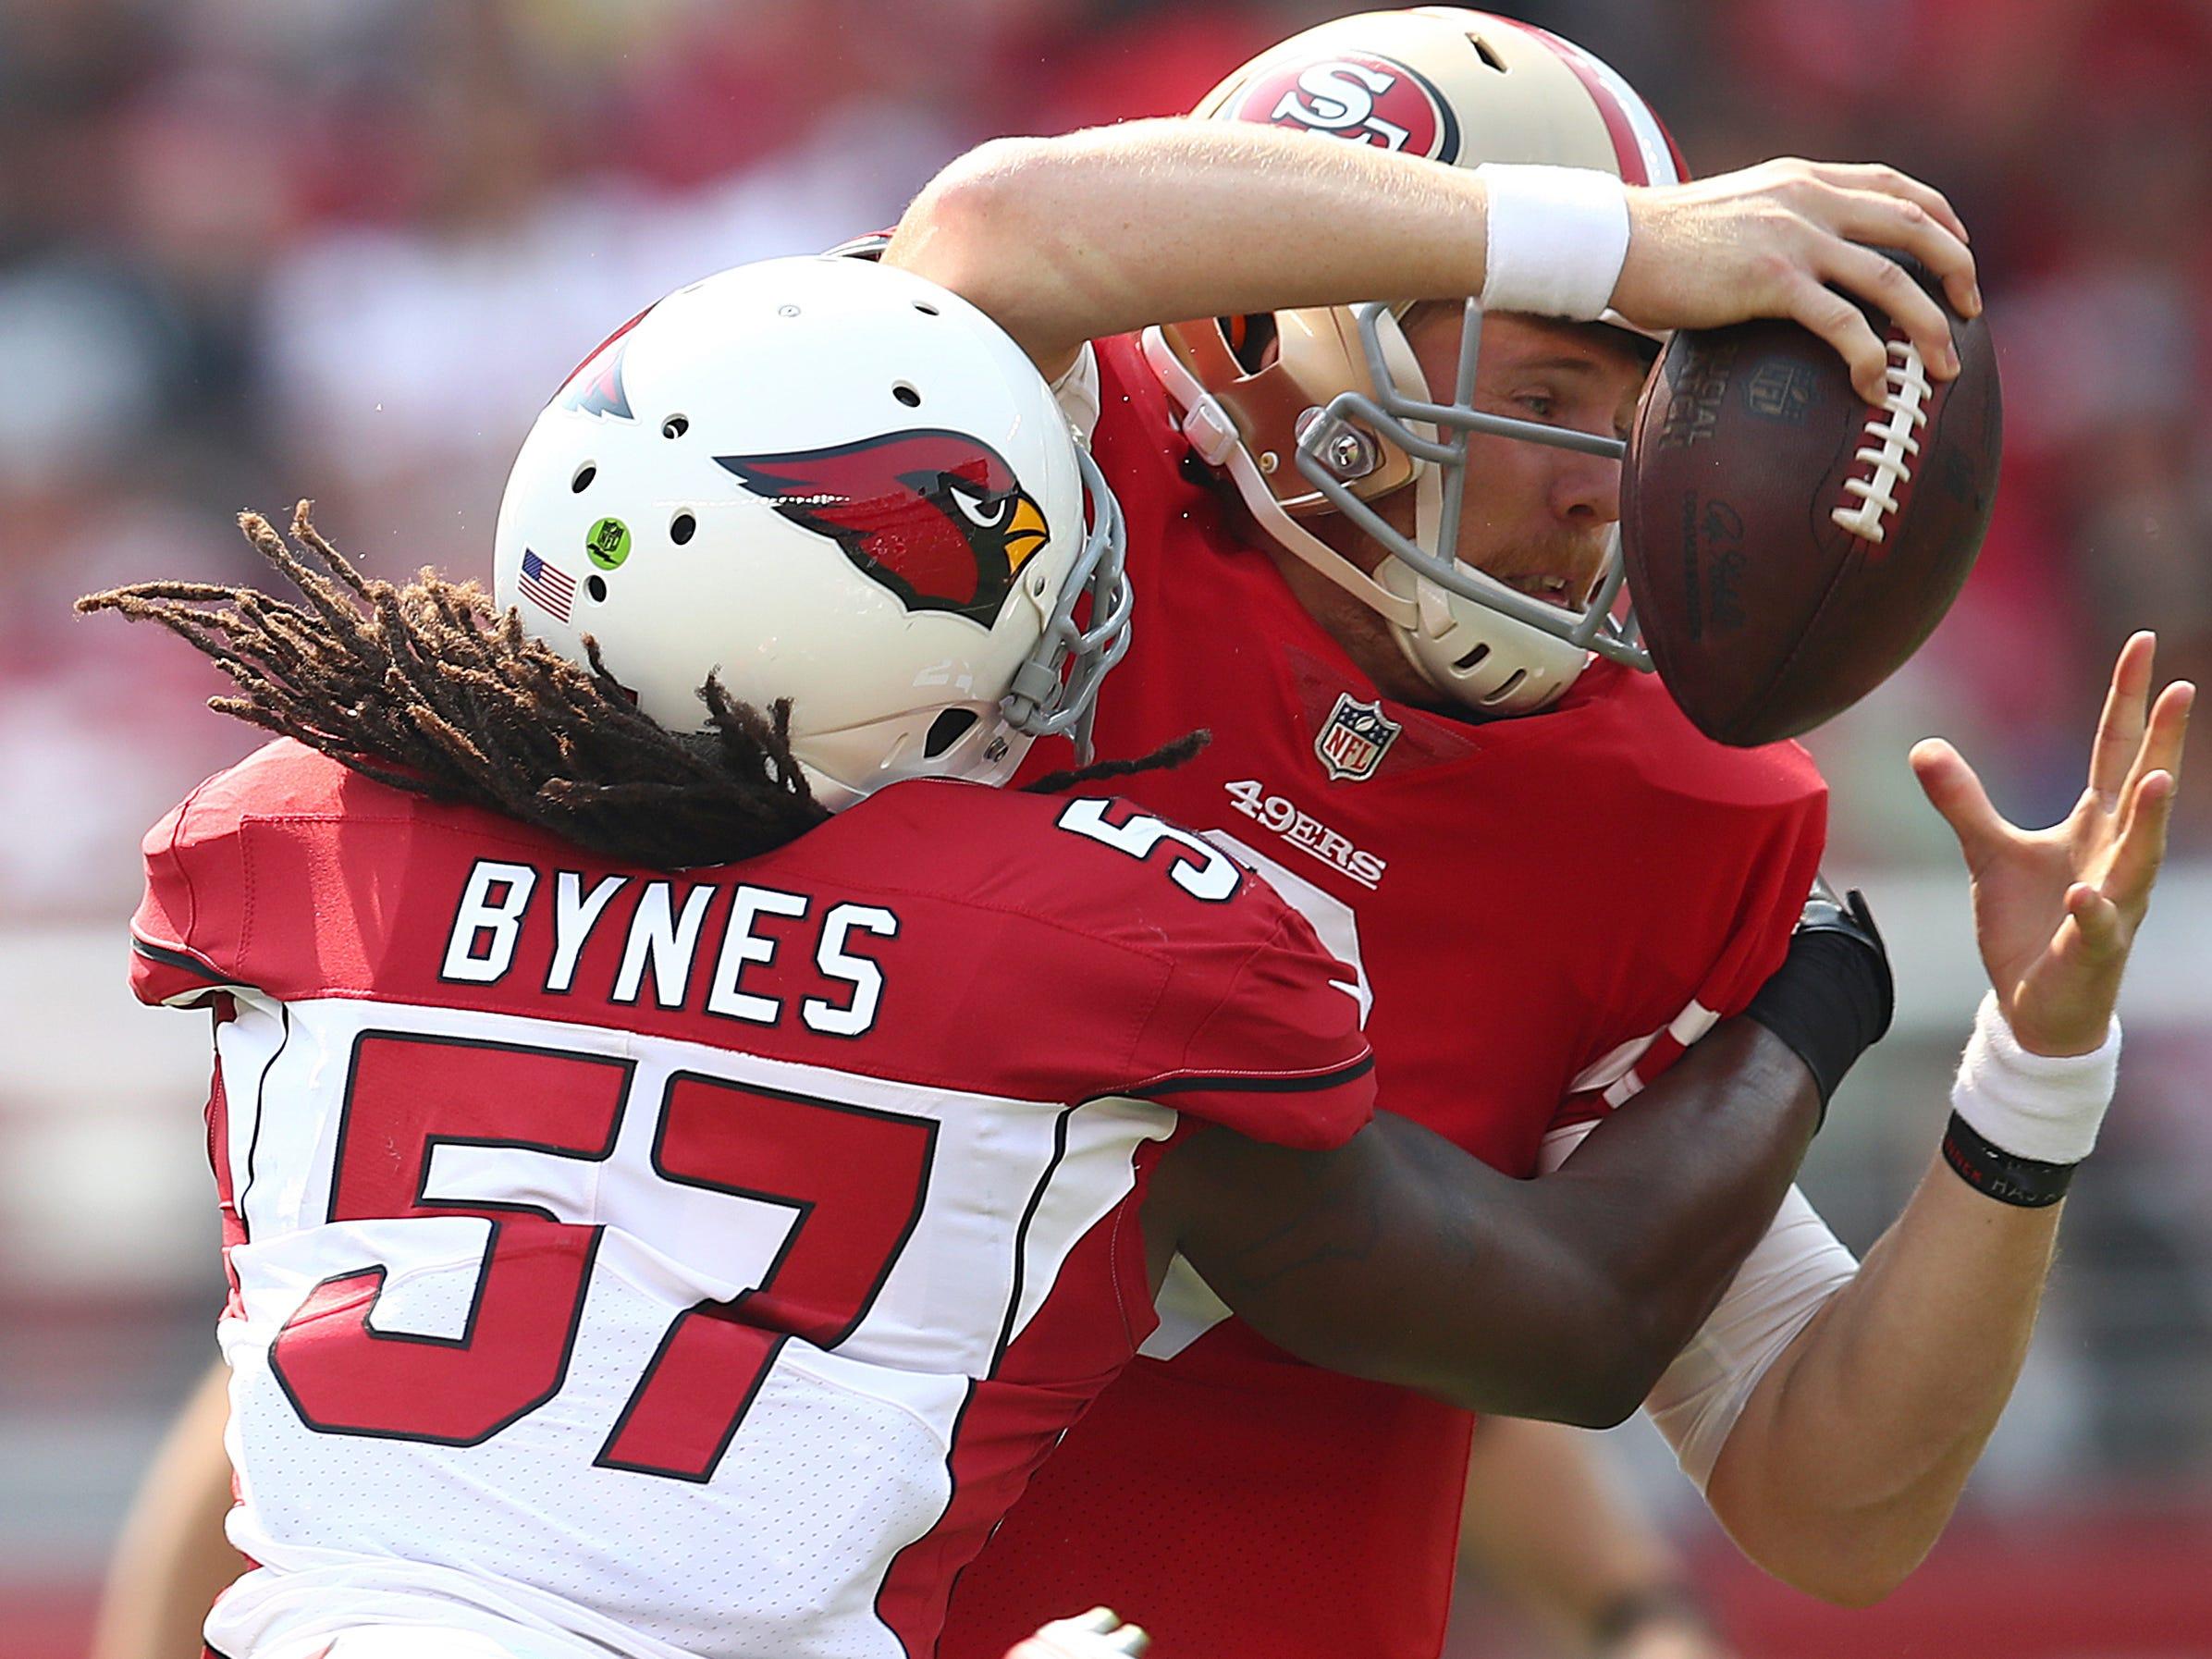 Arizona Cardinals linebacker Josh Bynes (57) sacks San Francisco 49ers quarterback C.J. Beathard during the first half of an NFL football game in Santa Clara, Calif., Sunday, Oct. 7, 2018.